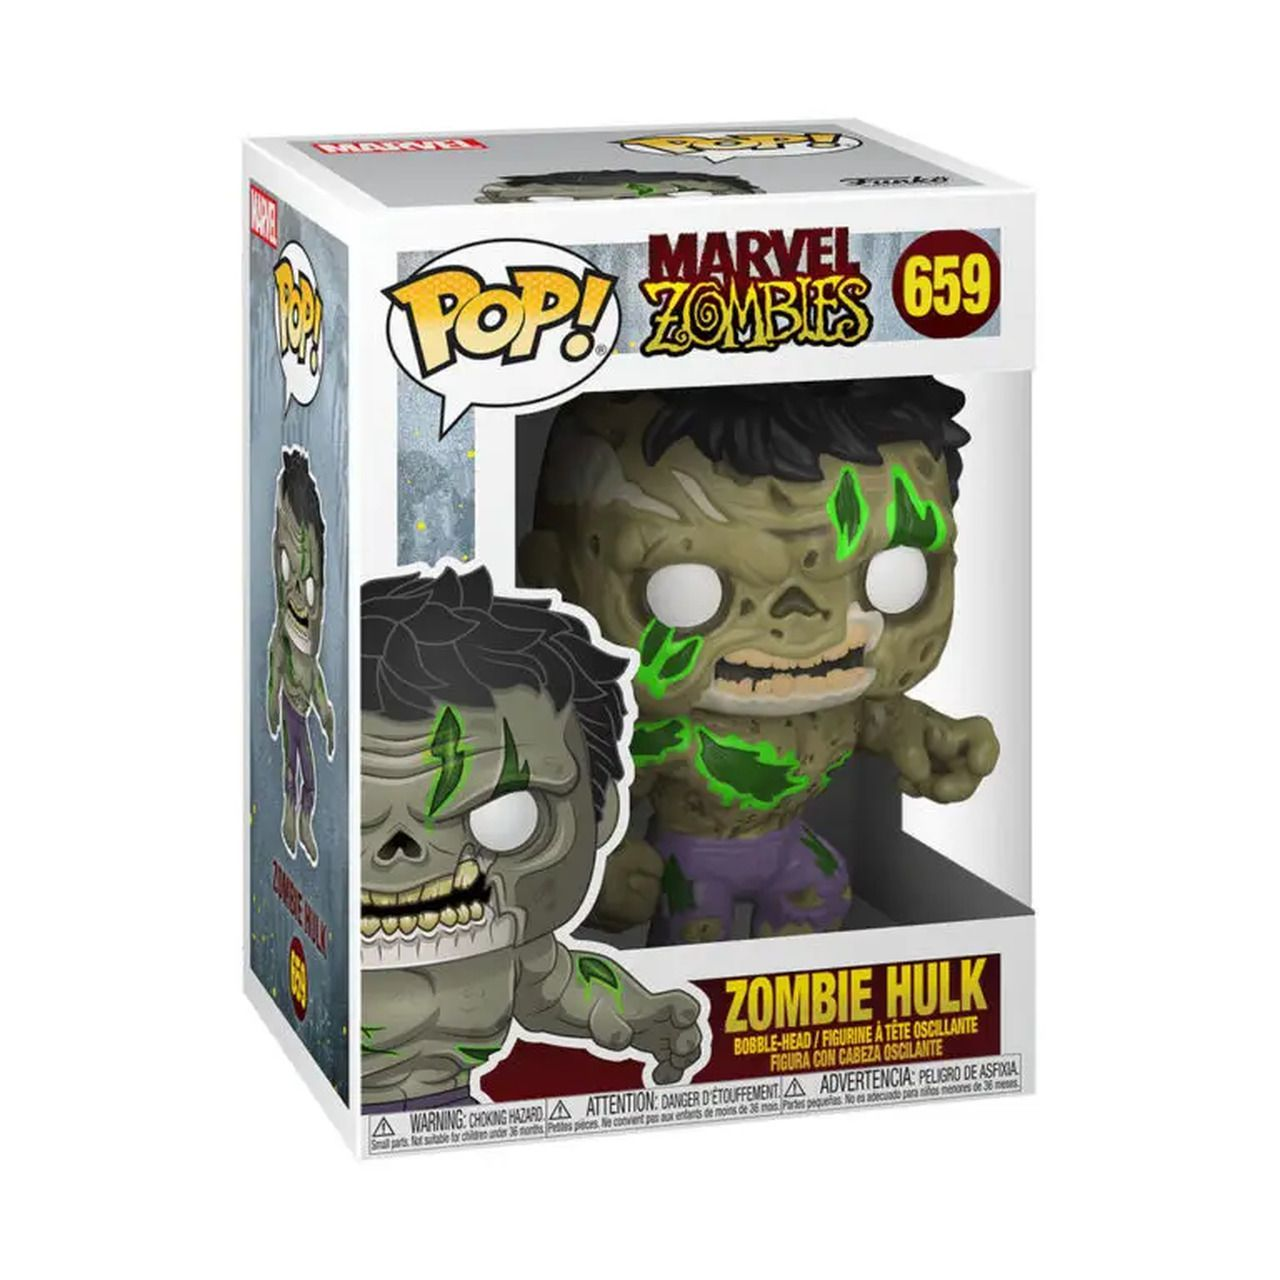 PRÉ VENDA: Funko Pop! Marvel Zombies: Hulk #659 - Funkoween - Funko